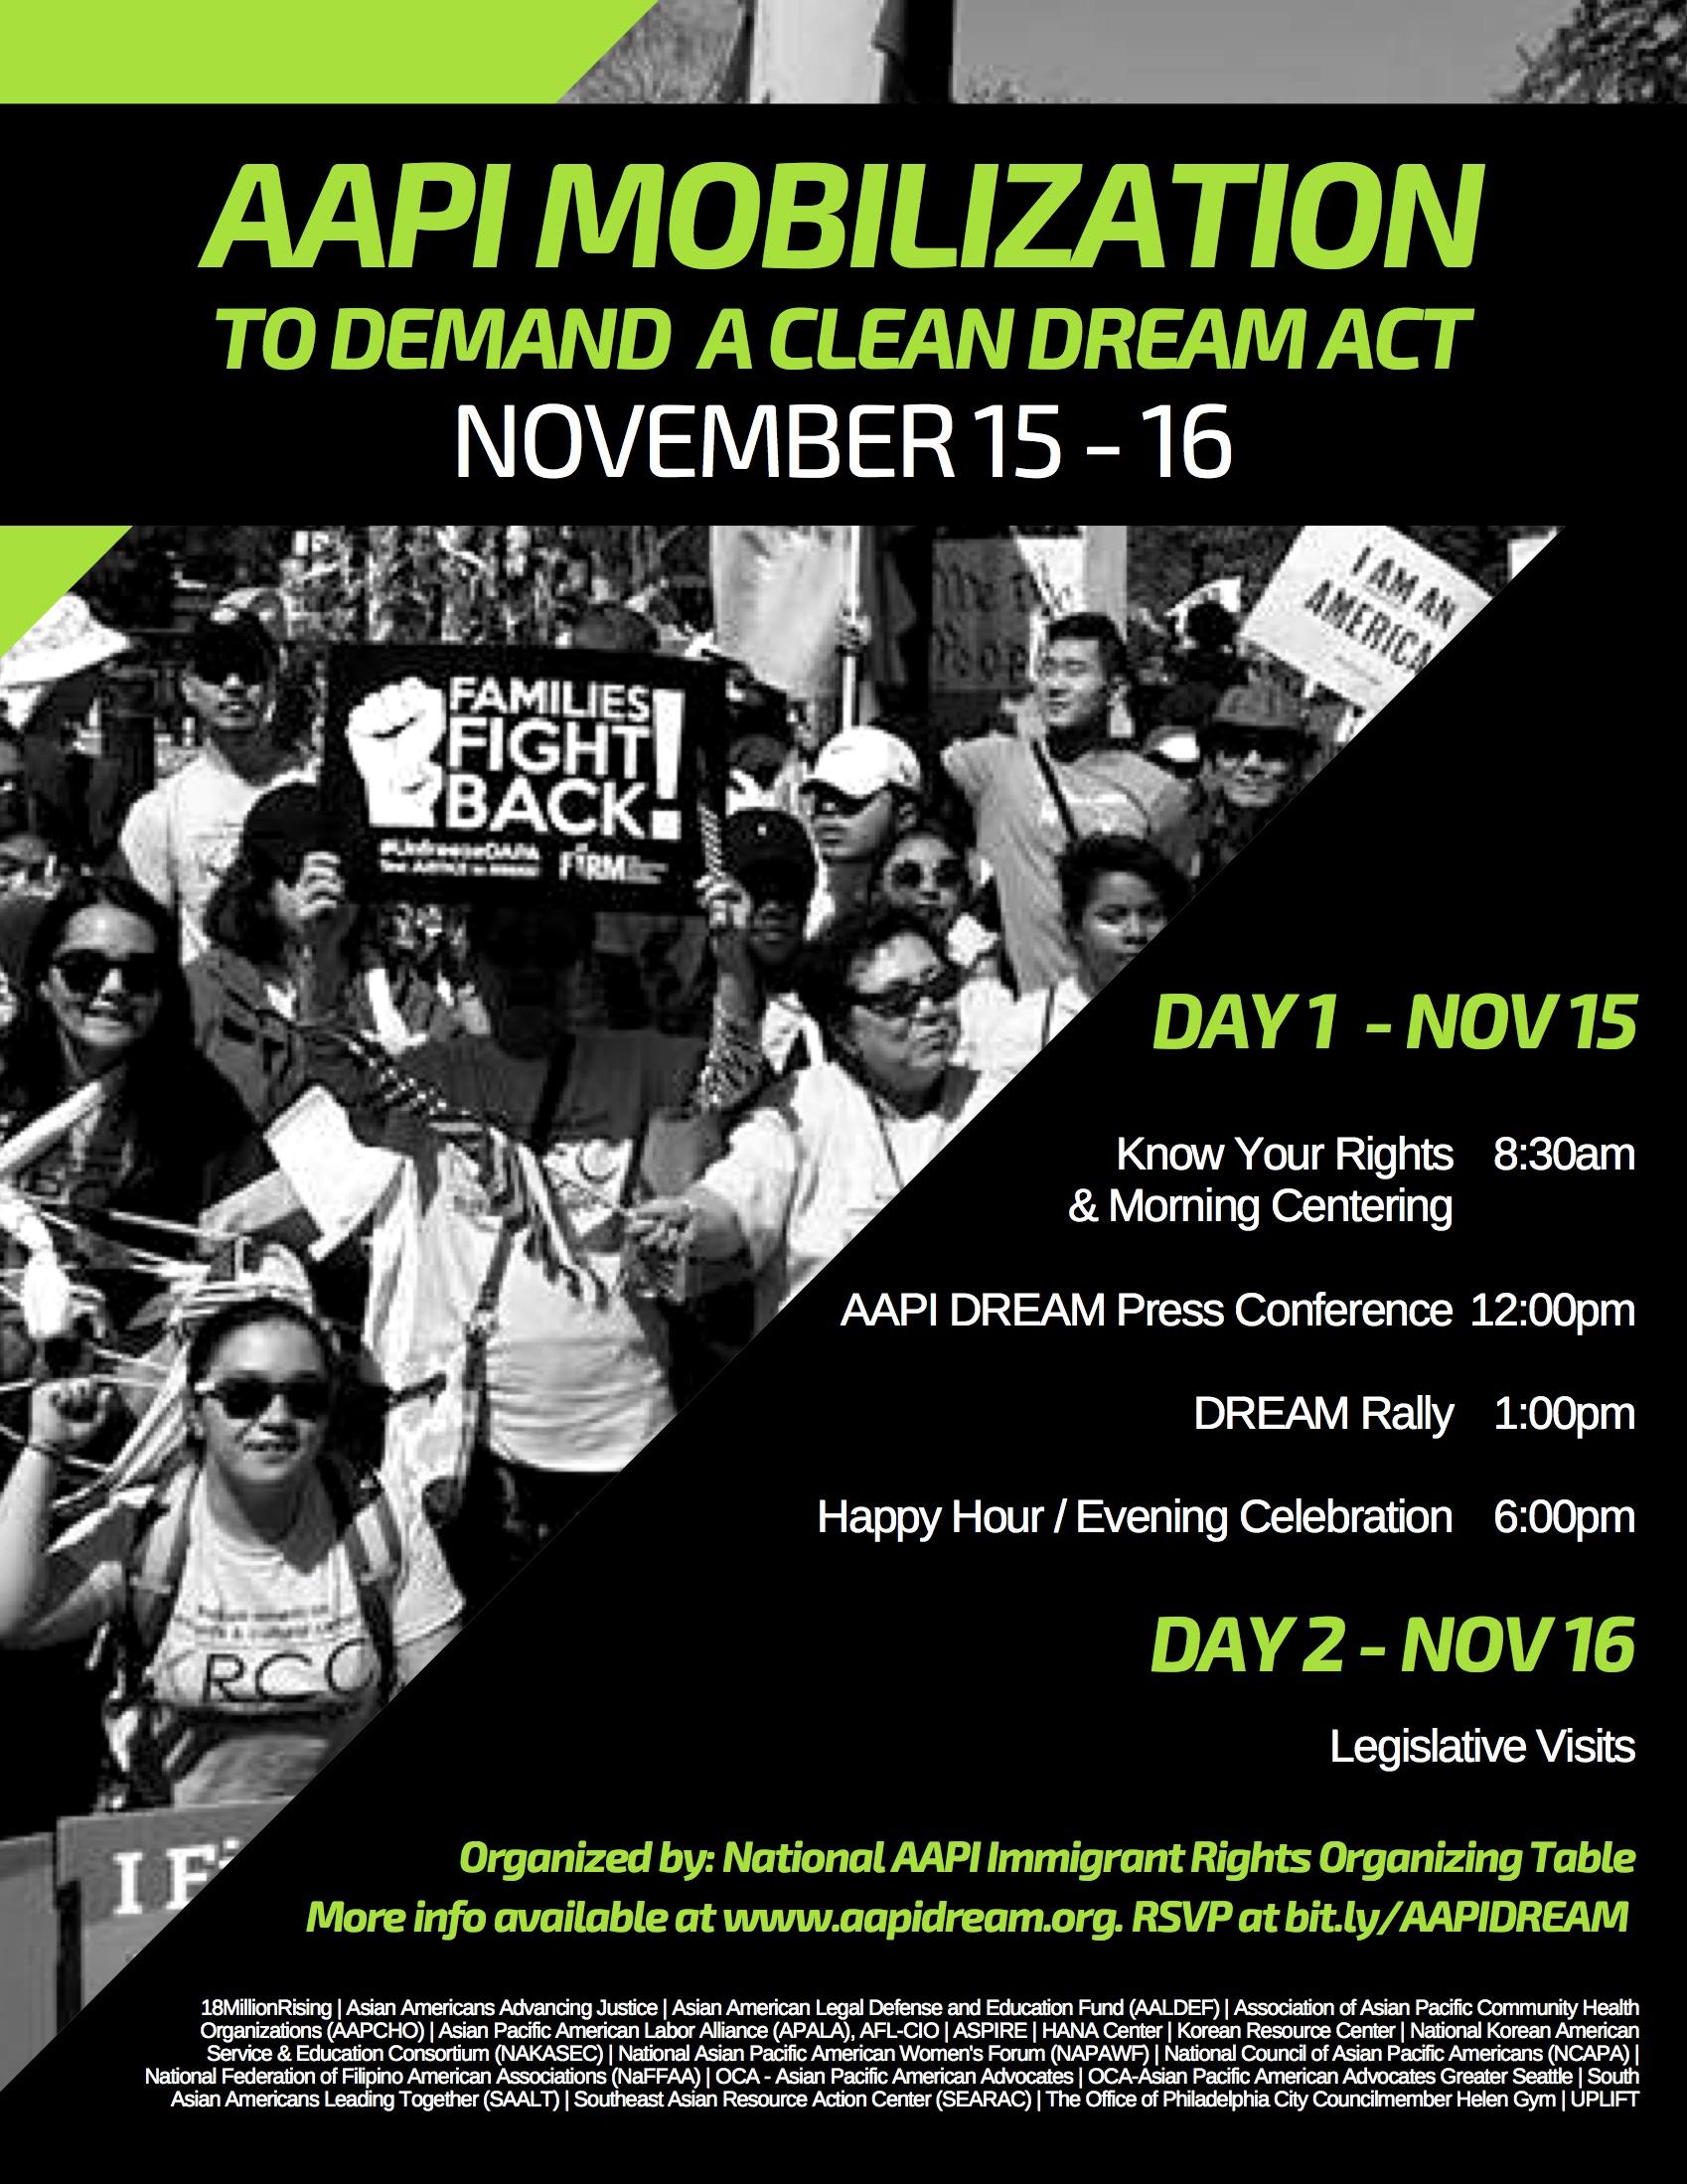 AAPI November DREAM Mobilization.jpg